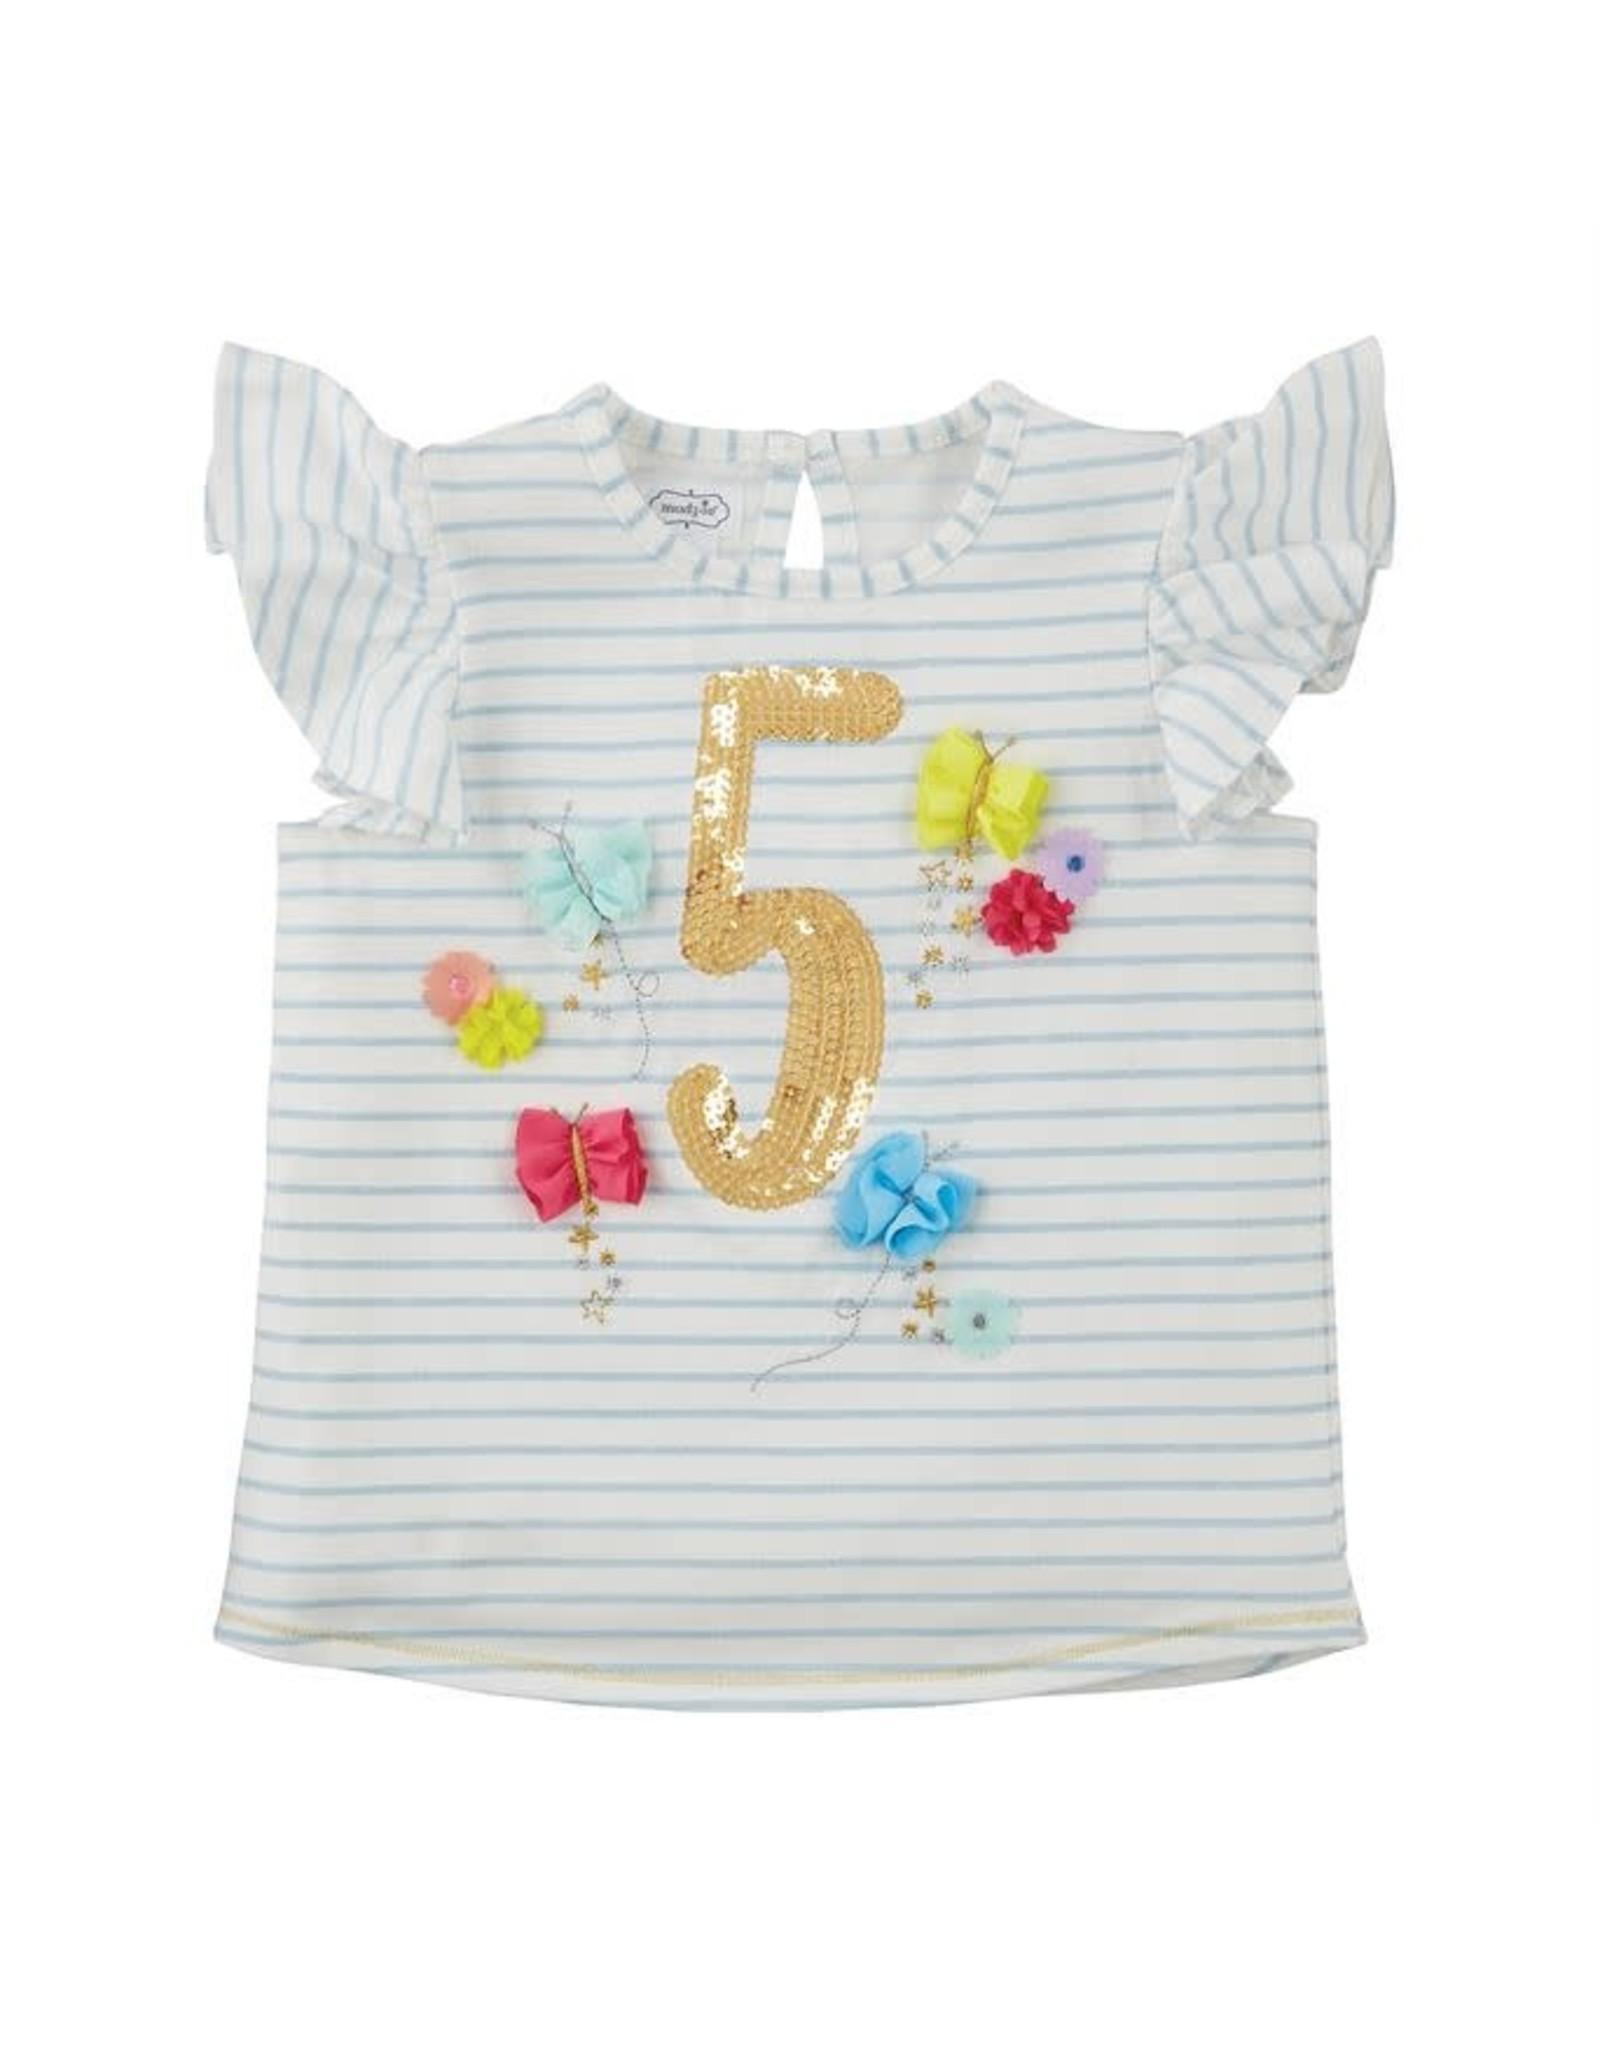 Mudpie Mud Pie- Five Birthday Shirt 5T